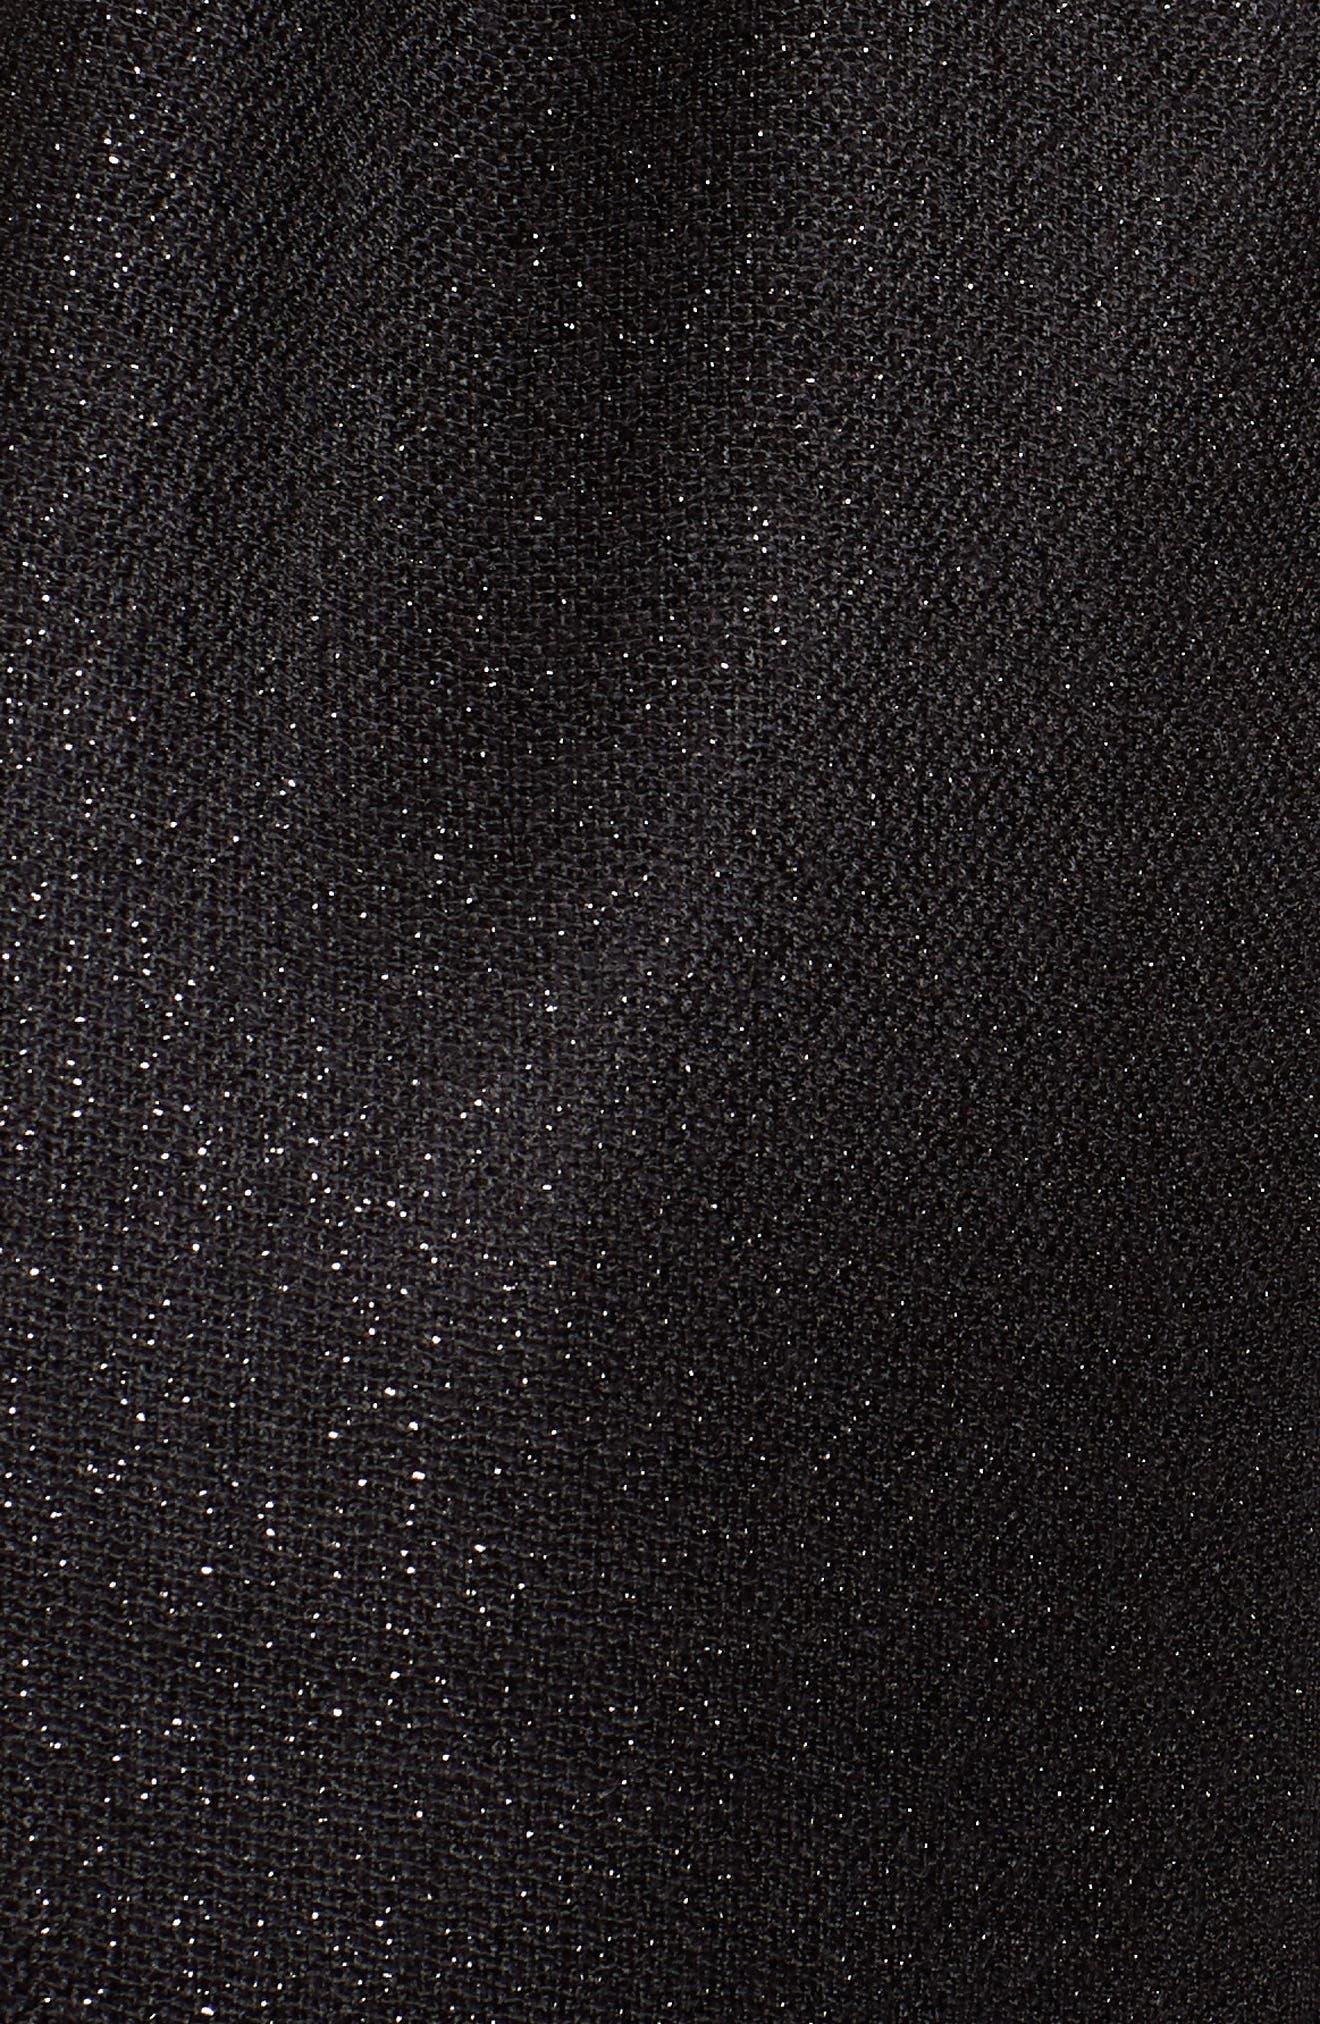 Metallic Lightweight Wrap,                             Alternate thumbnail 5, color,                             001